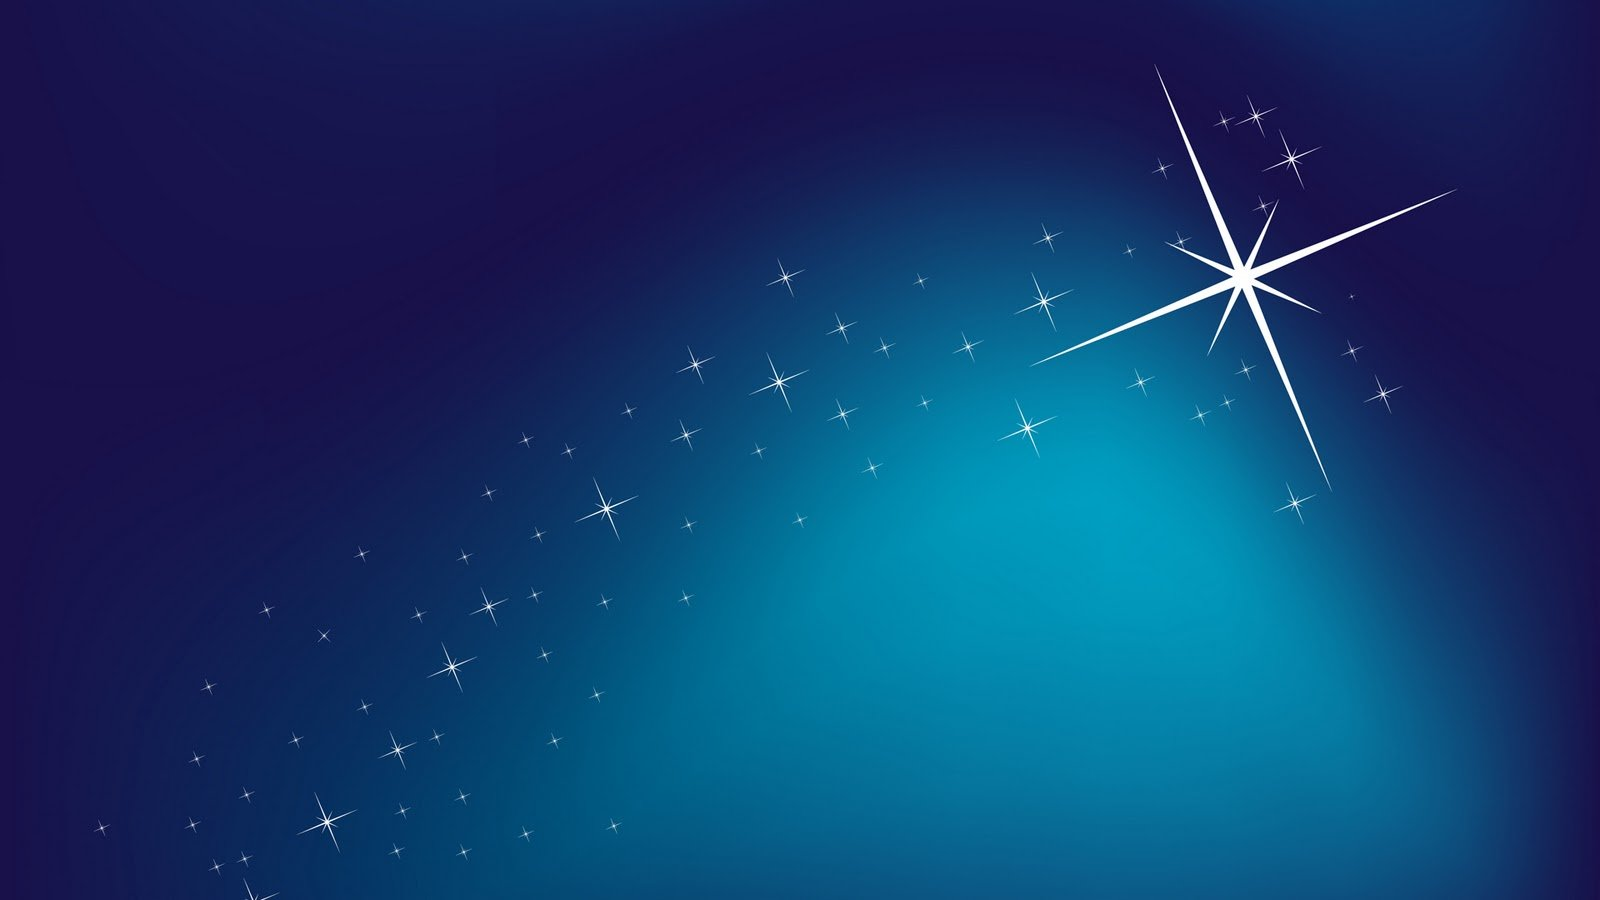 Фон для открытки звезды